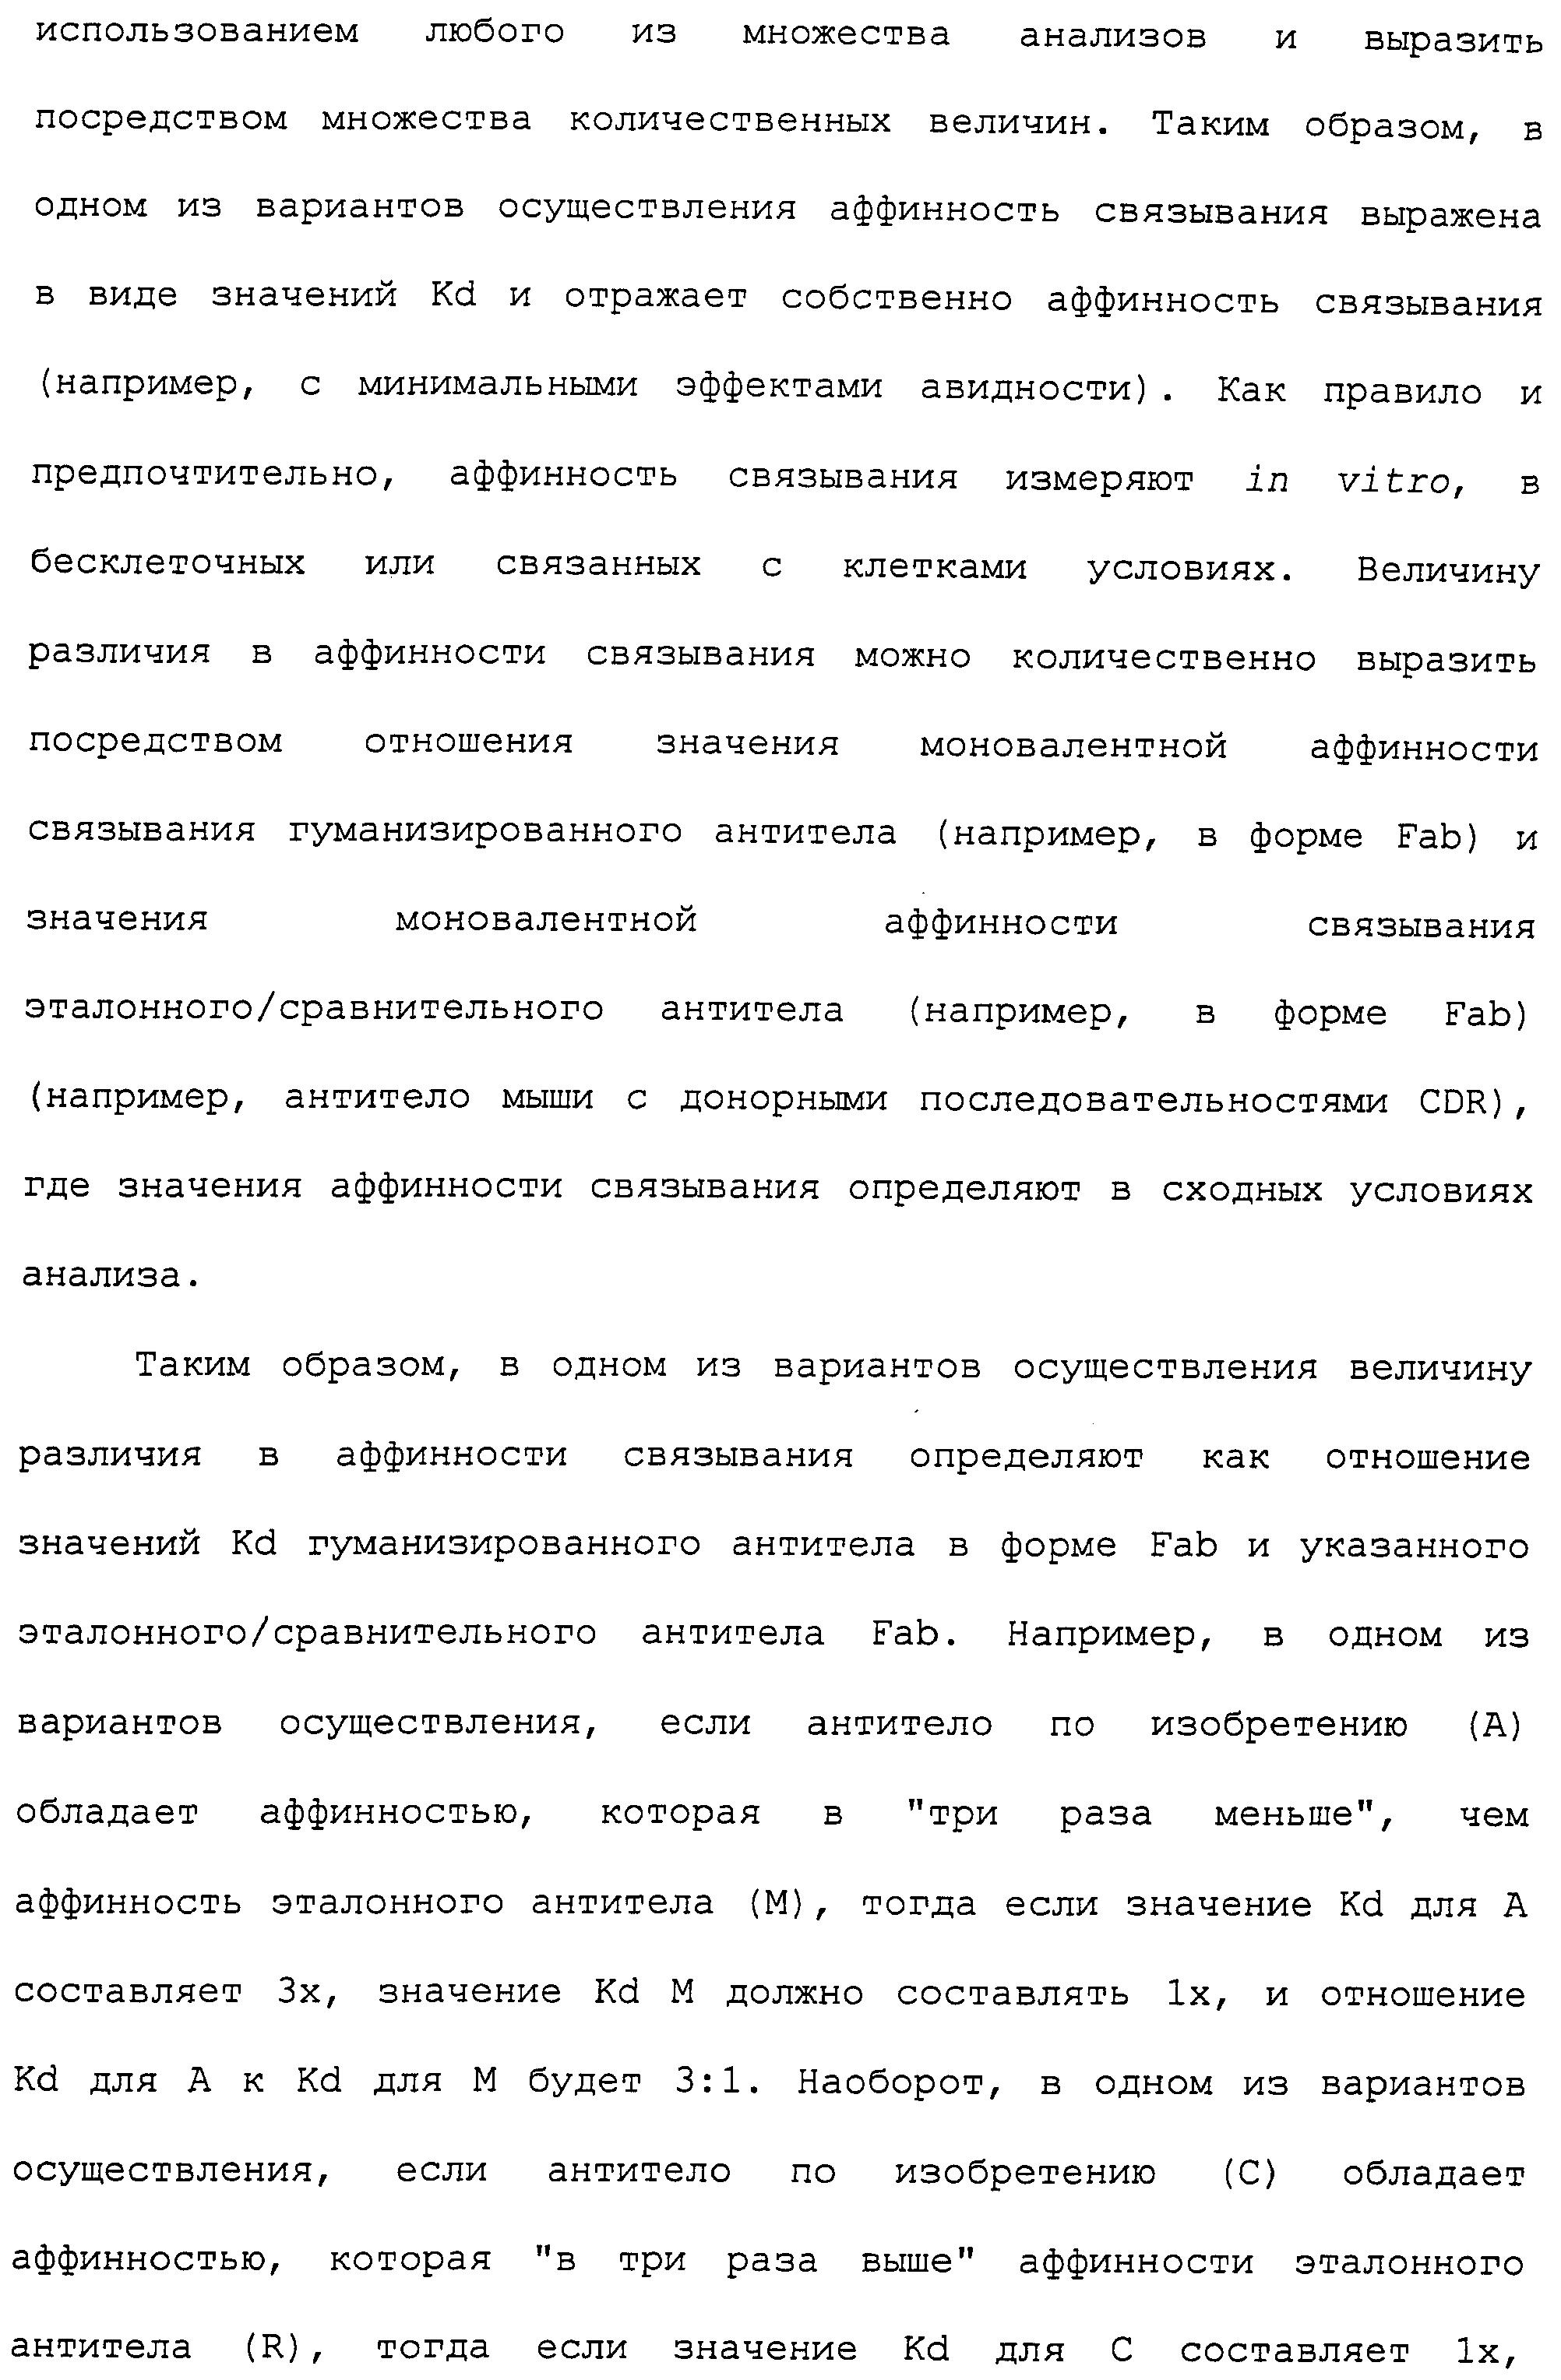 Figure 00000129